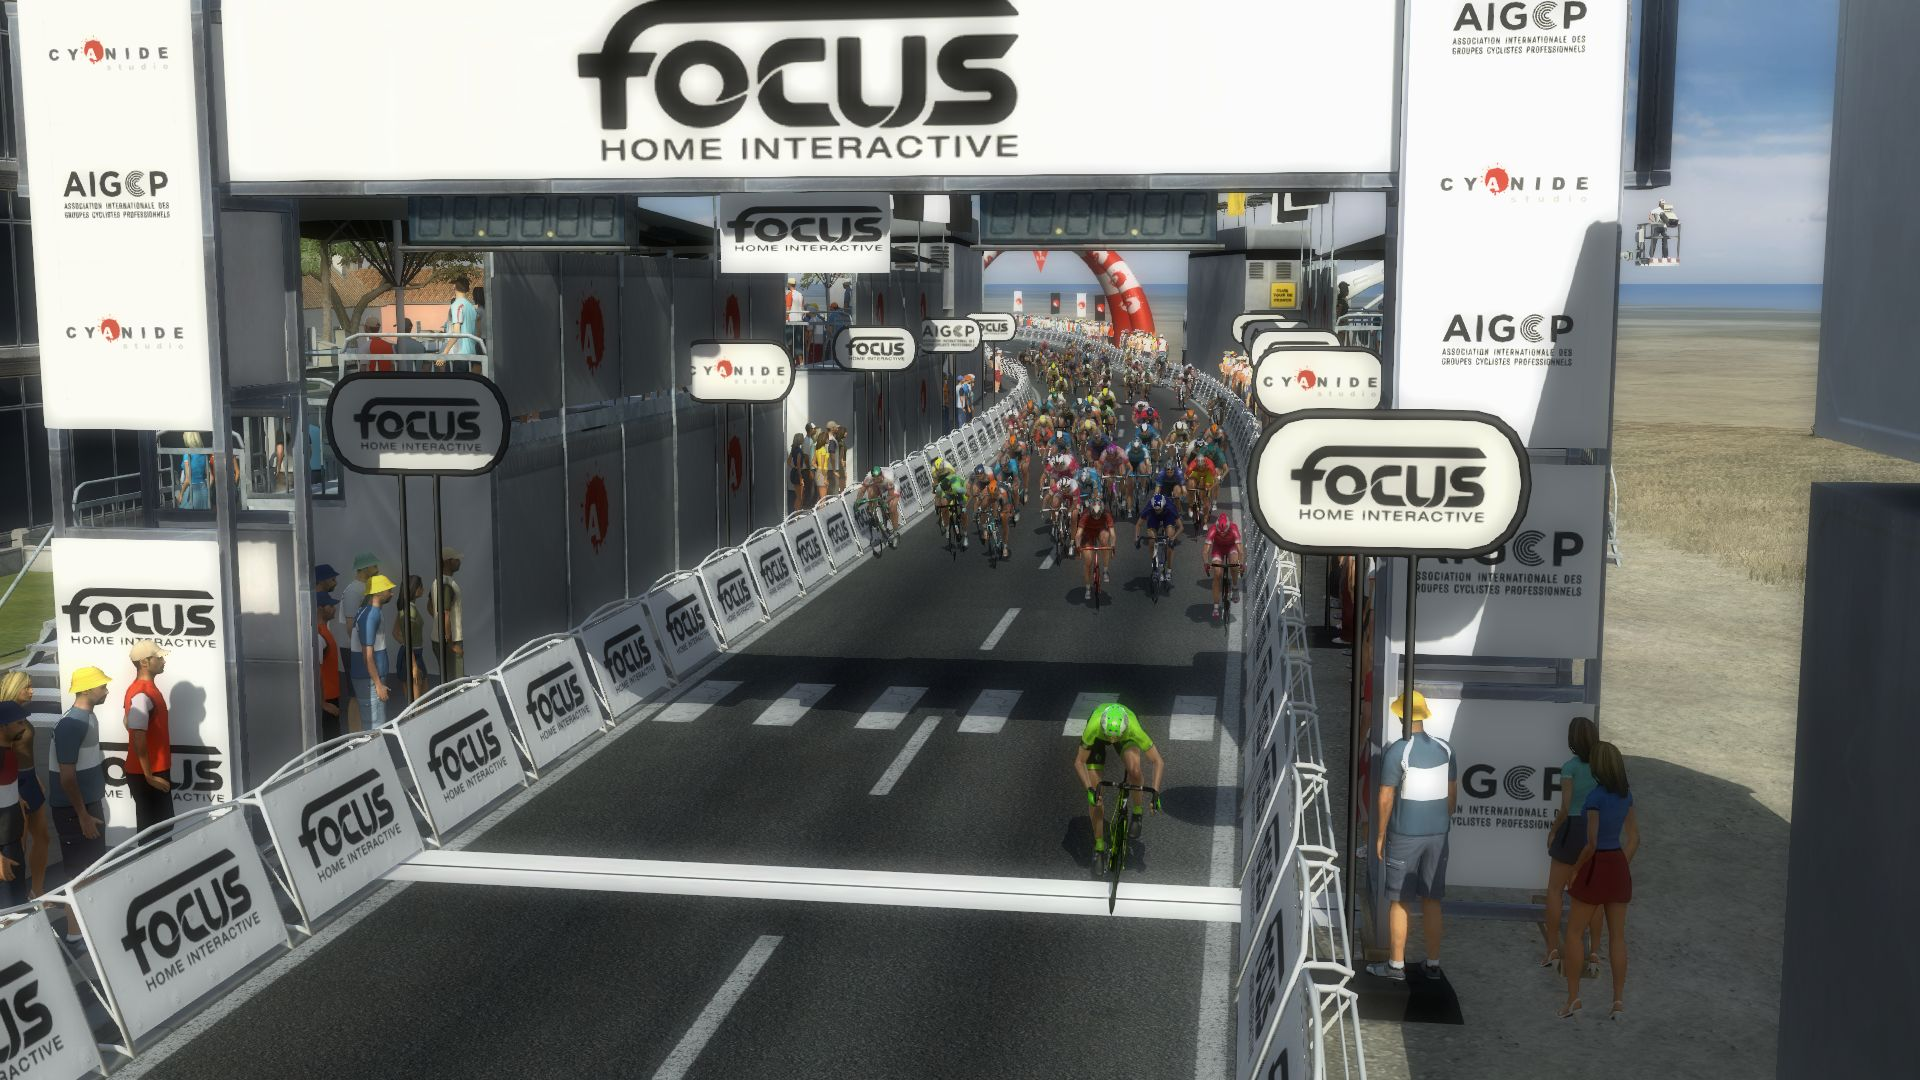 pcmdaily.com/images/mg/2019/Races/PT/Qatar/mg19_qat_s01_18.jpg